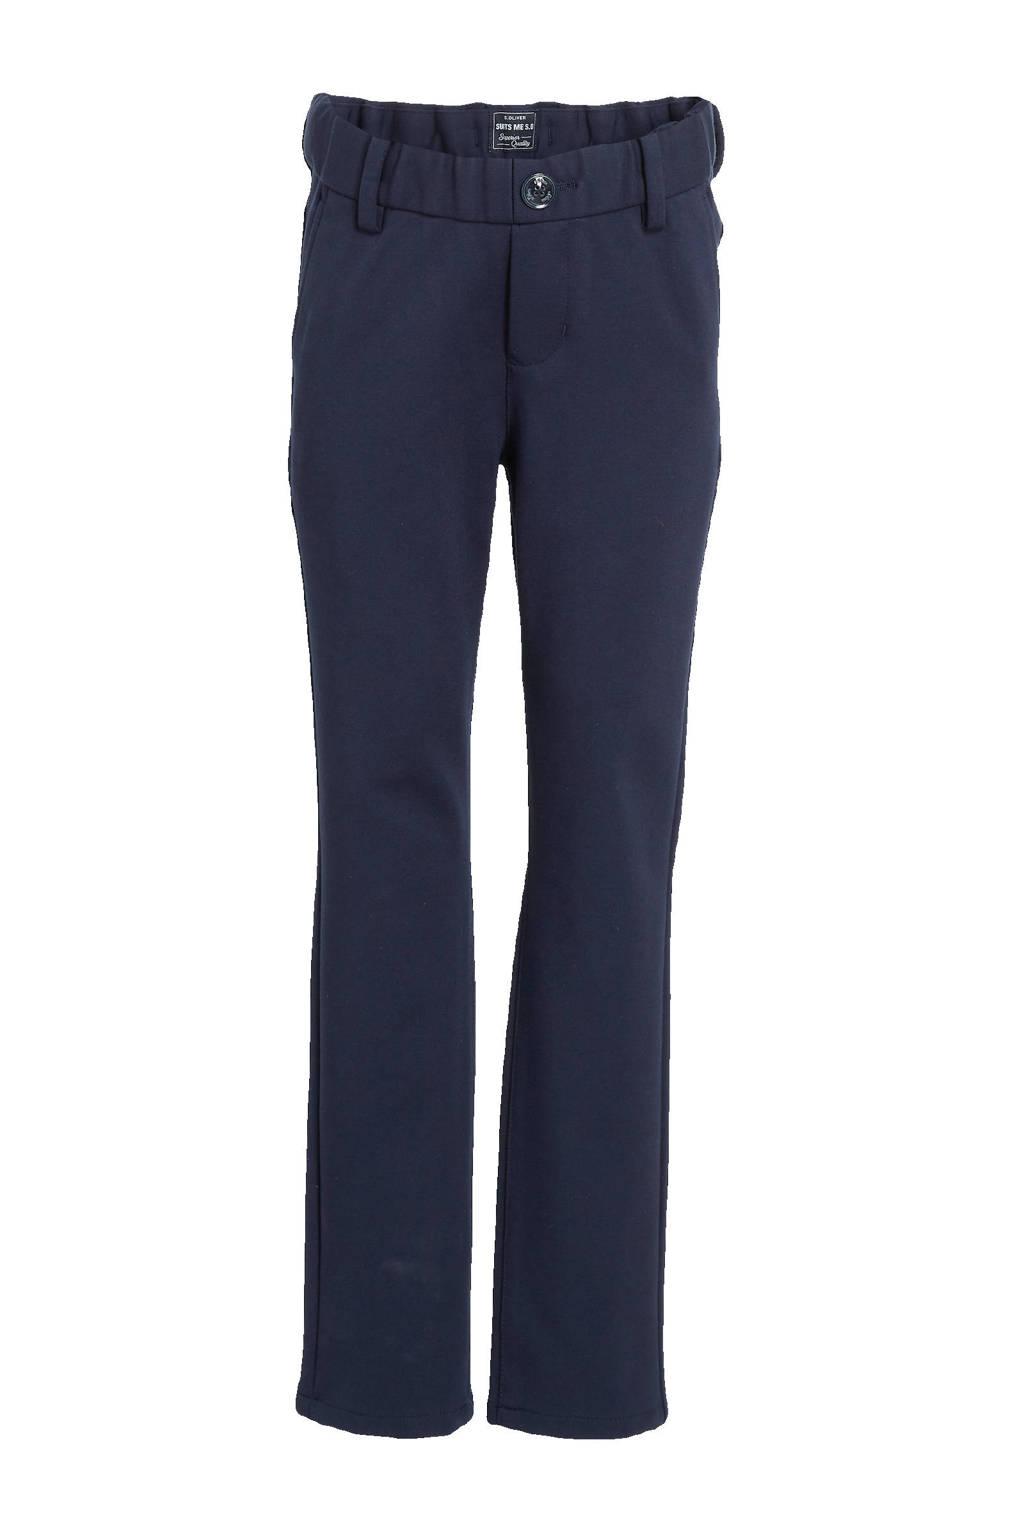 s.Oliver slim fit broek donkerblauw, Donkerblauw